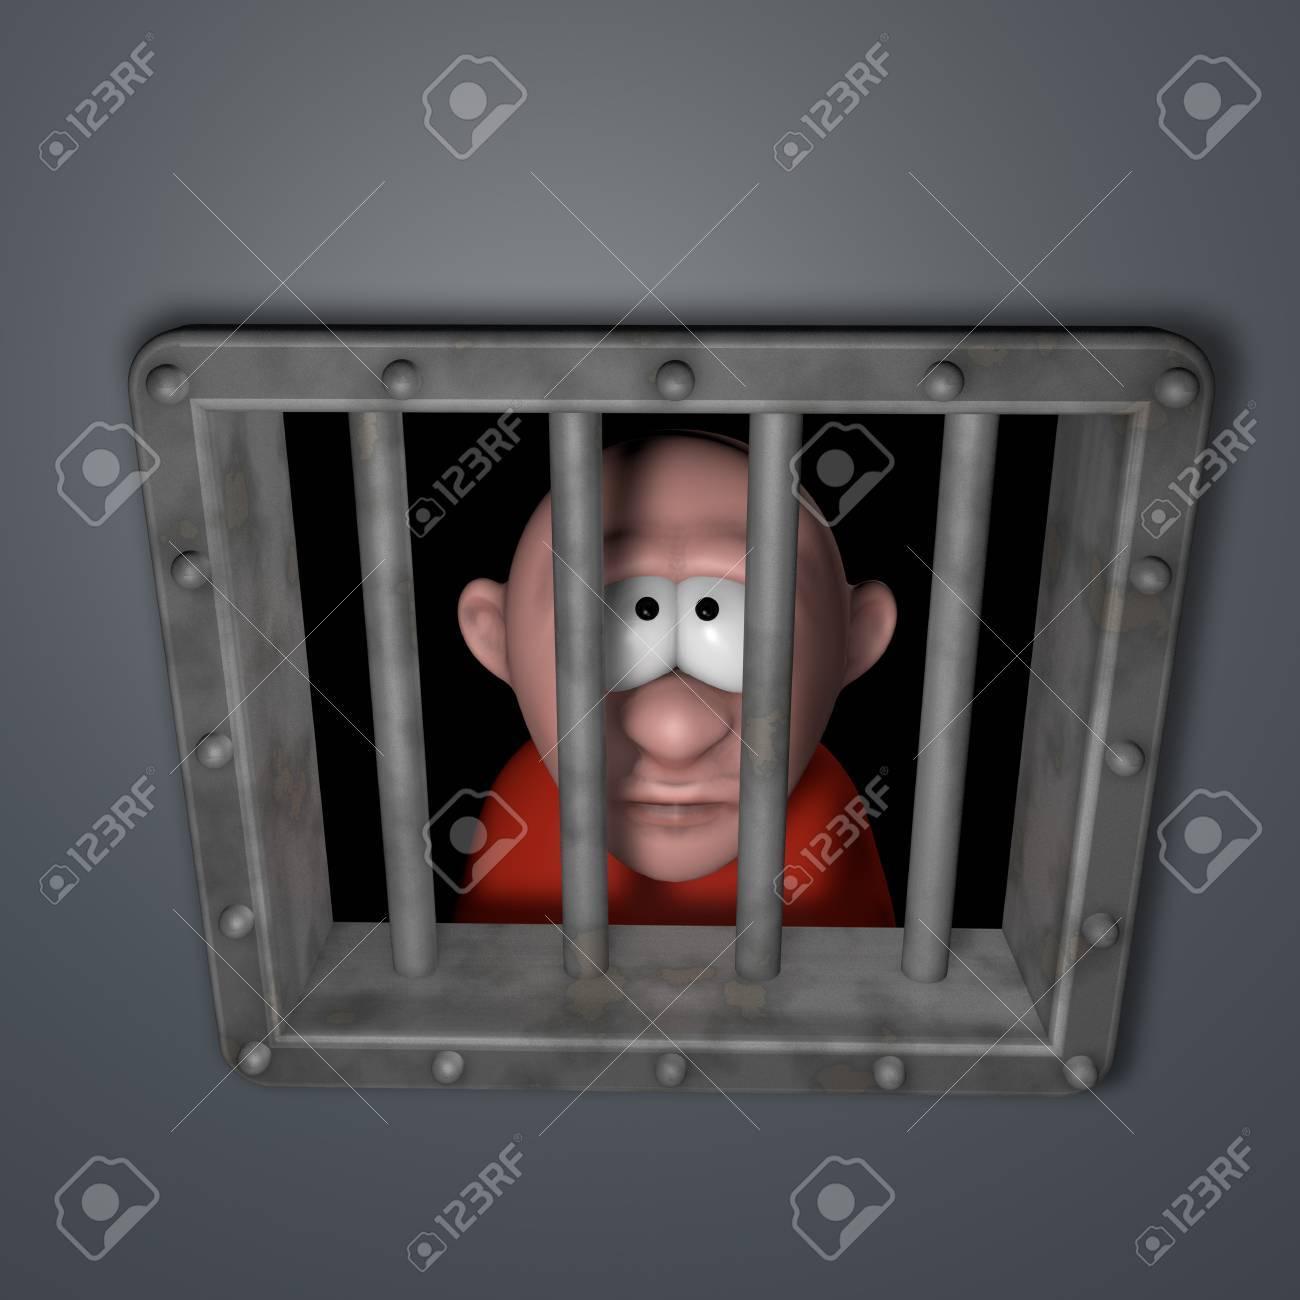 cartoon guy behind riveted steel prison window - 3d illustration Stock Photo - 16513222